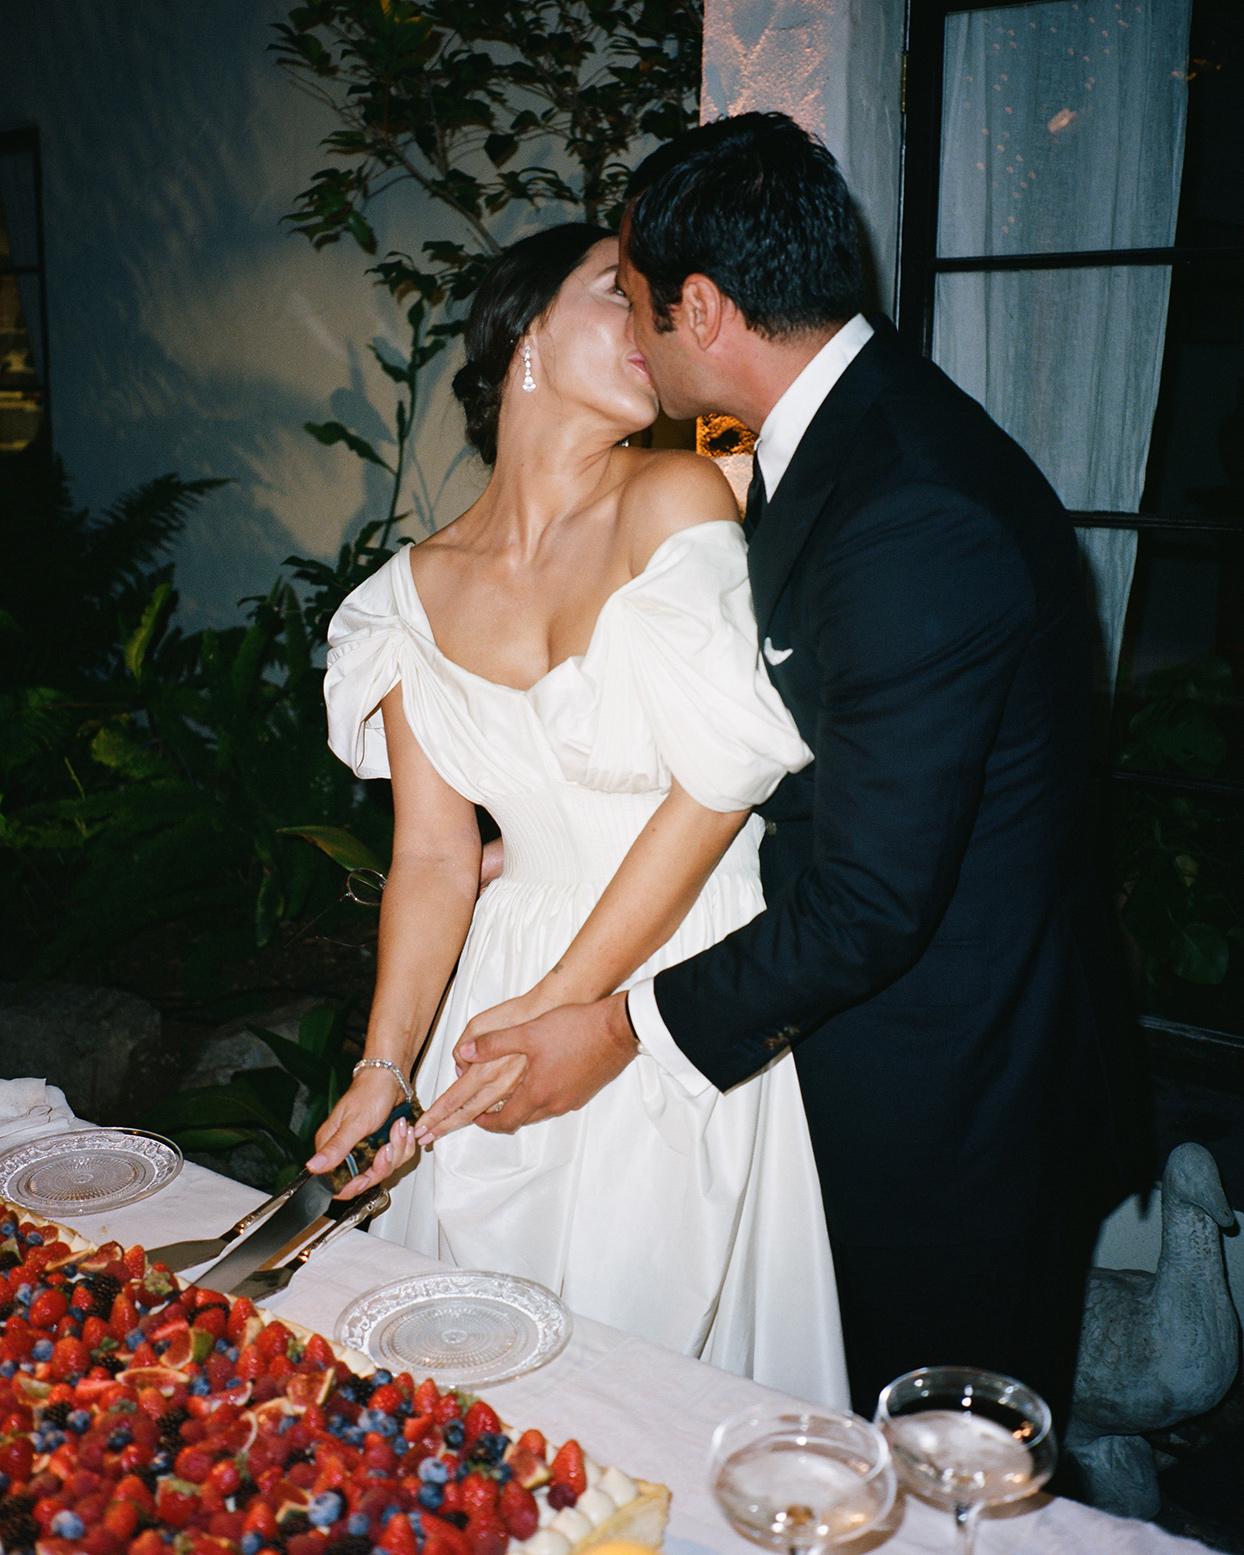 pia davide wedding cake cutting kiss